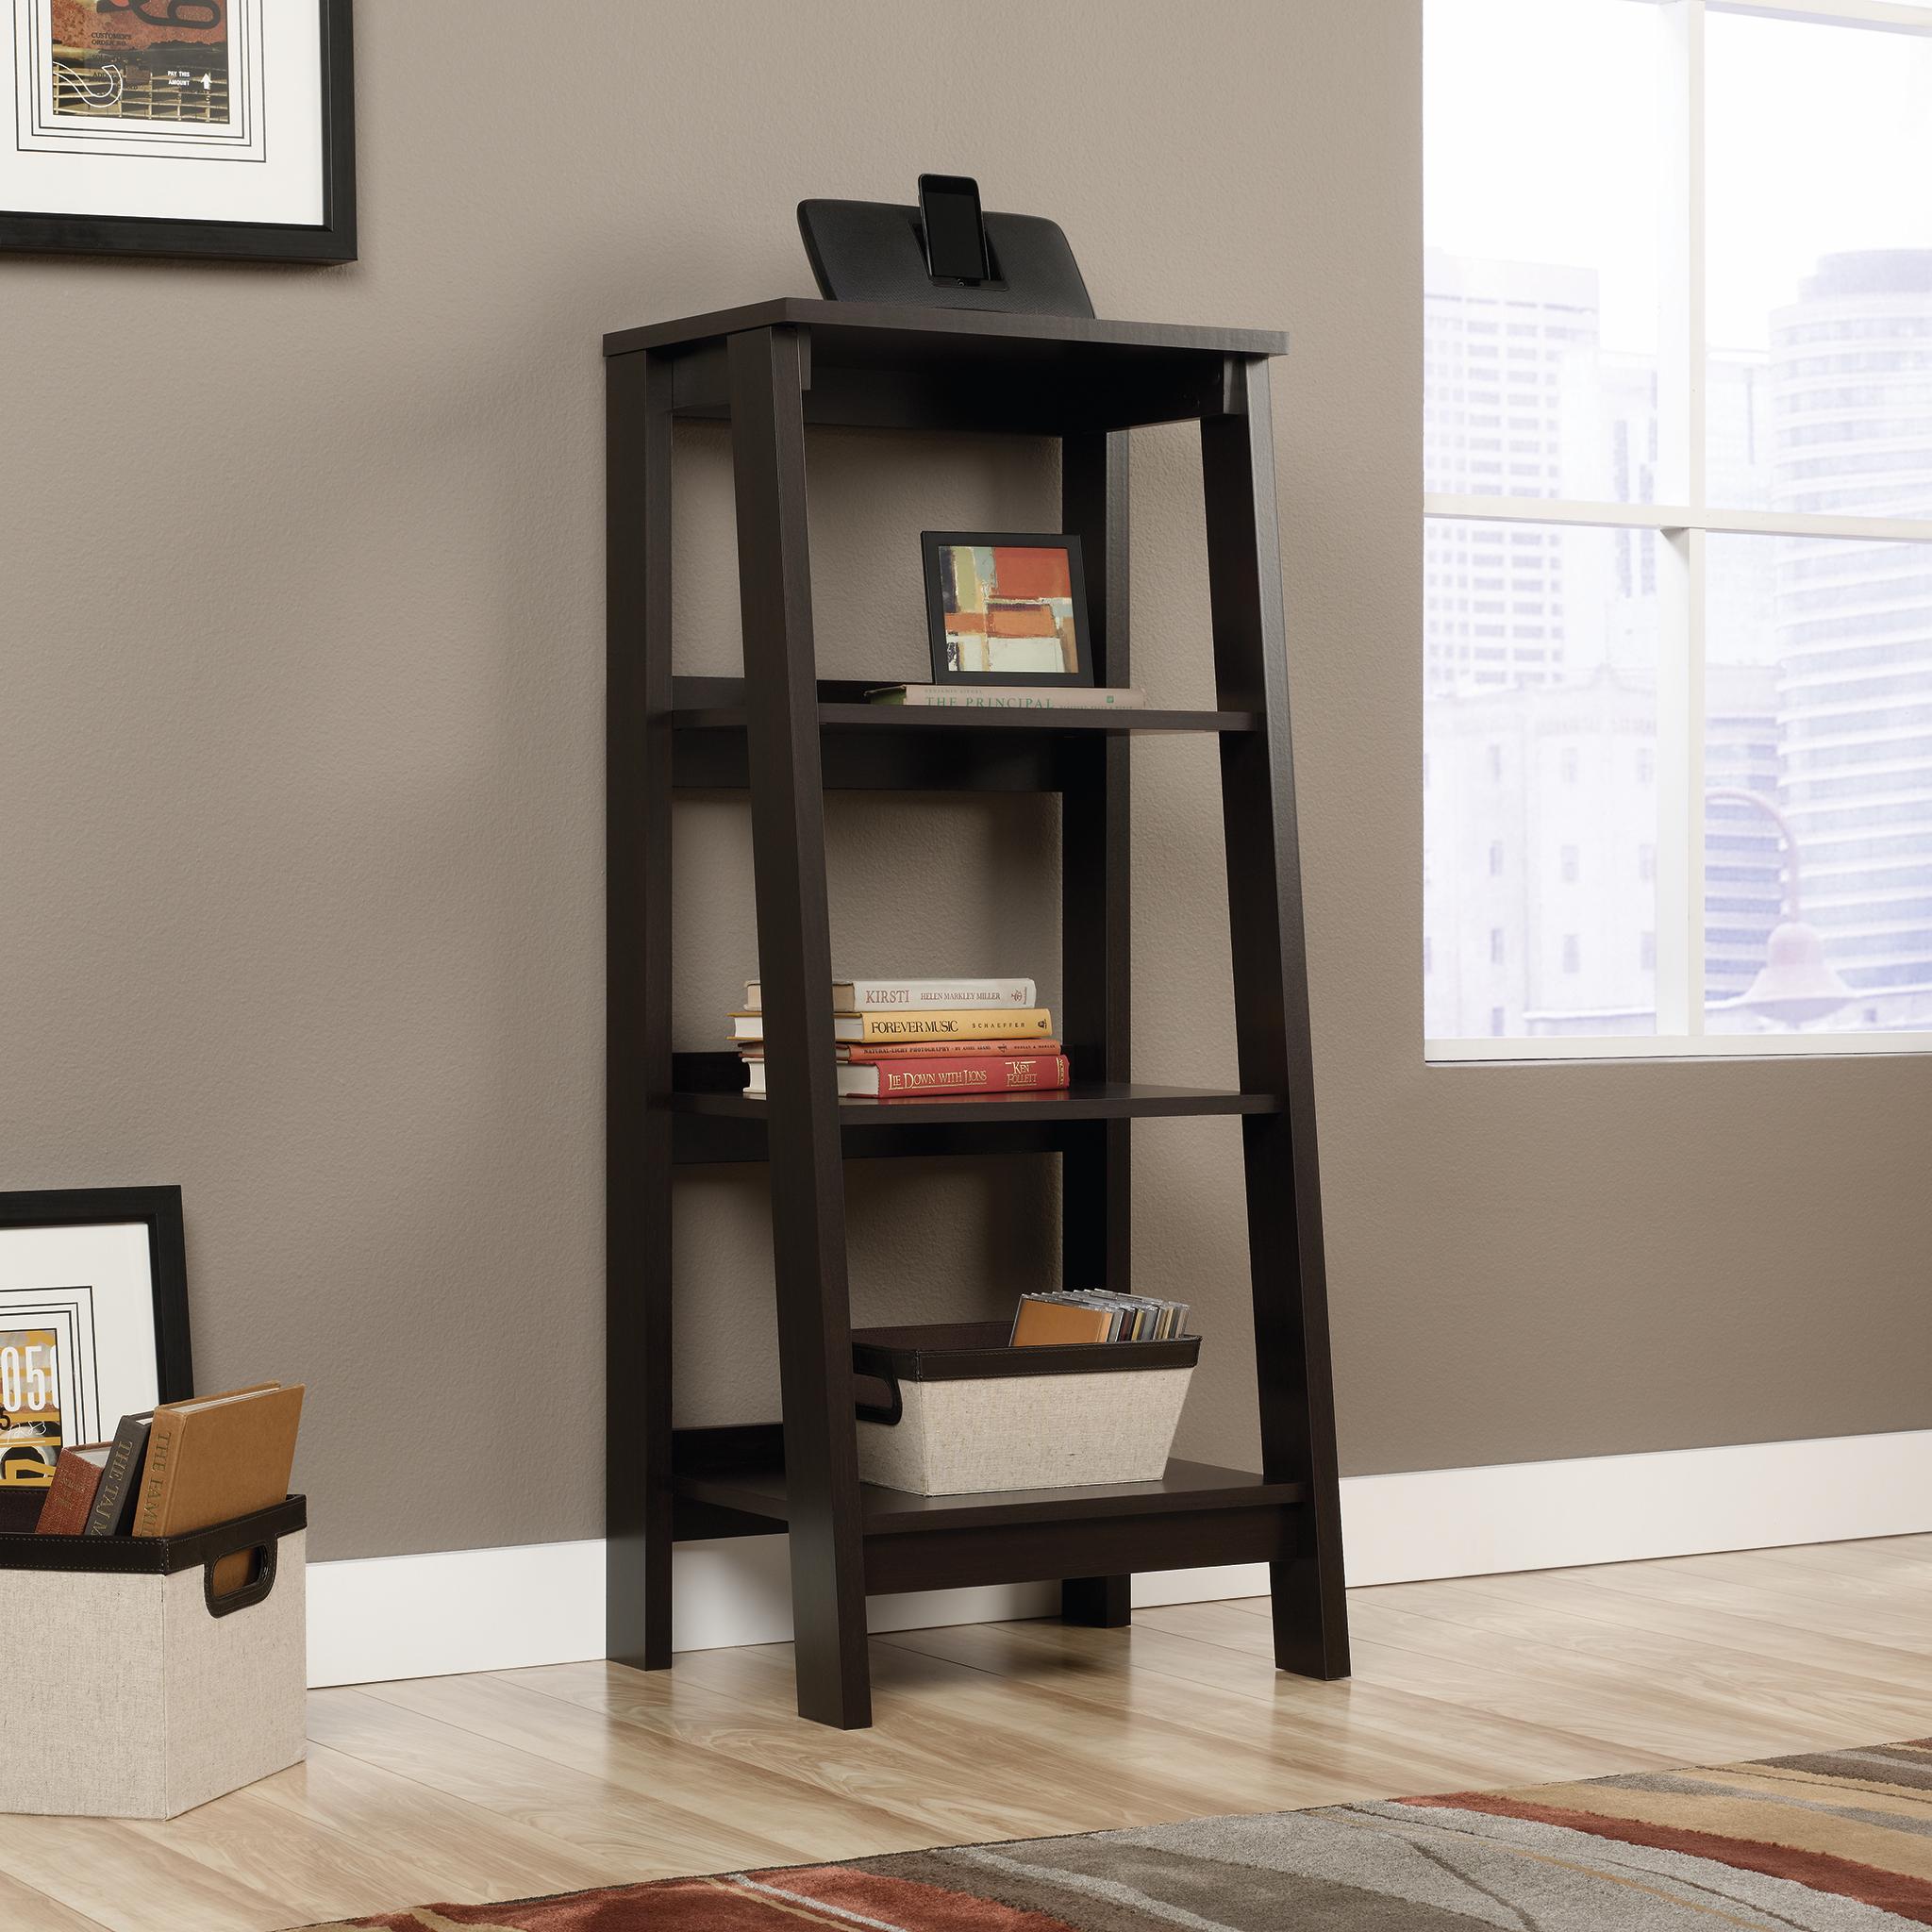 Sauder Trestle 3-Tier Bookcase